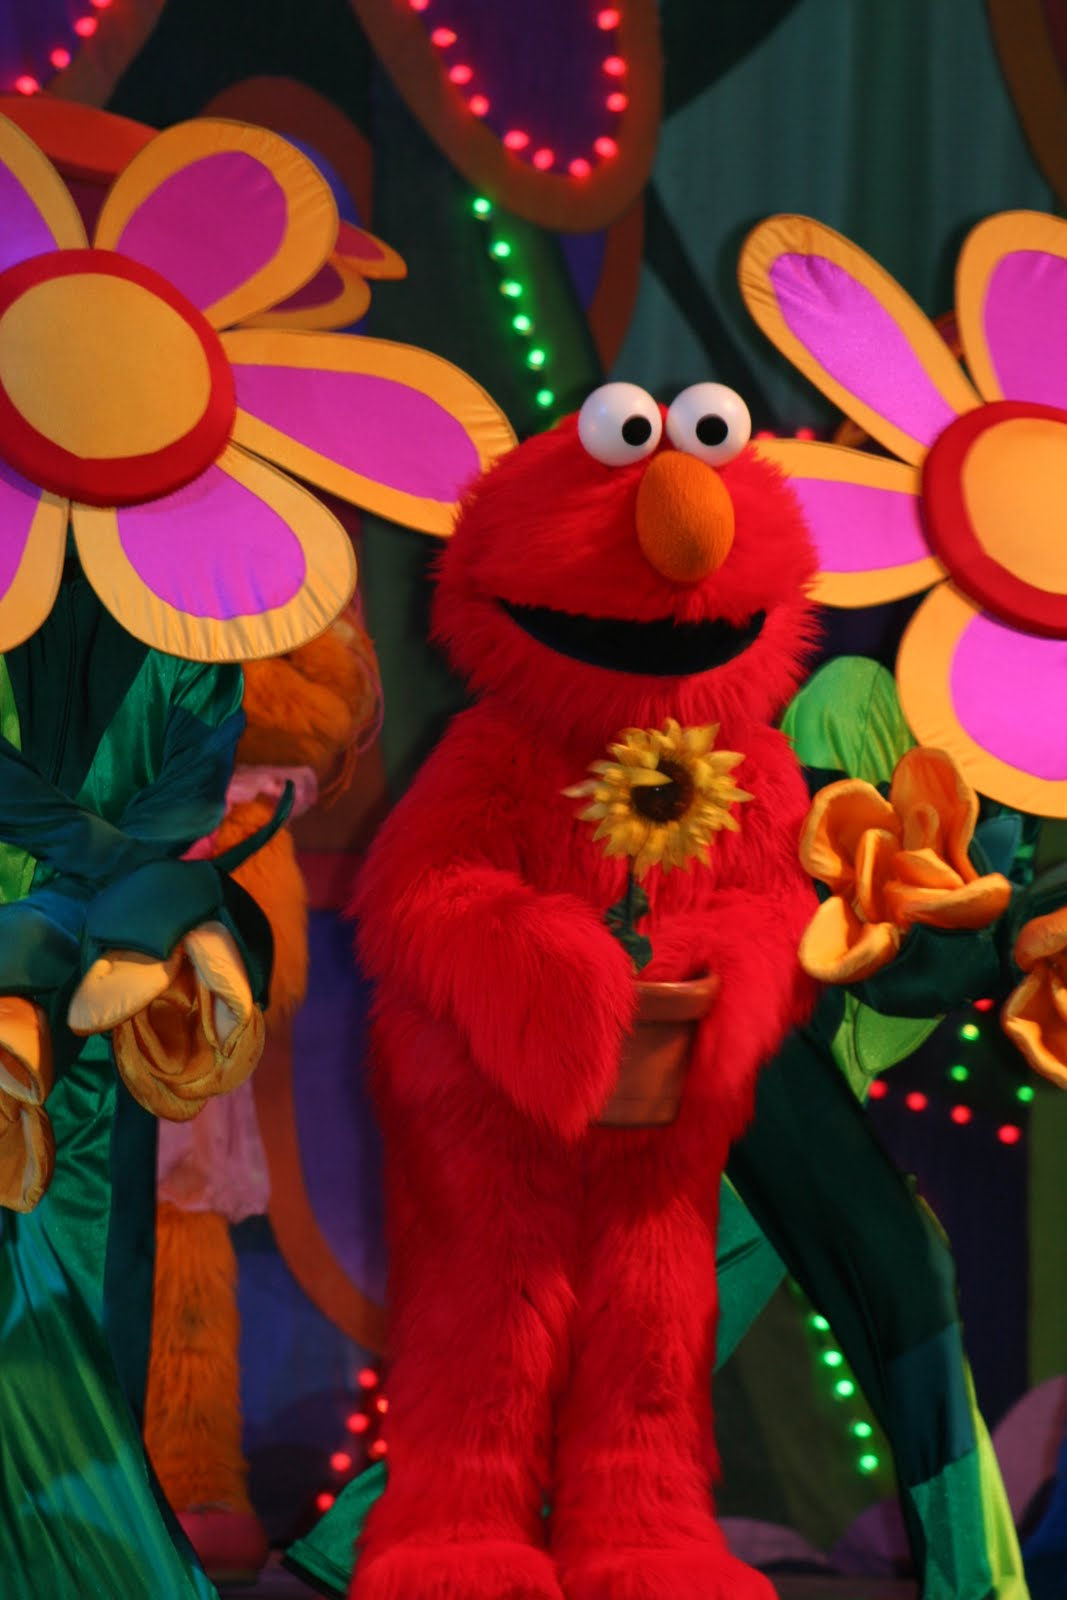 Elmo Sesame Street Sesame street live. elmou0026#39;s